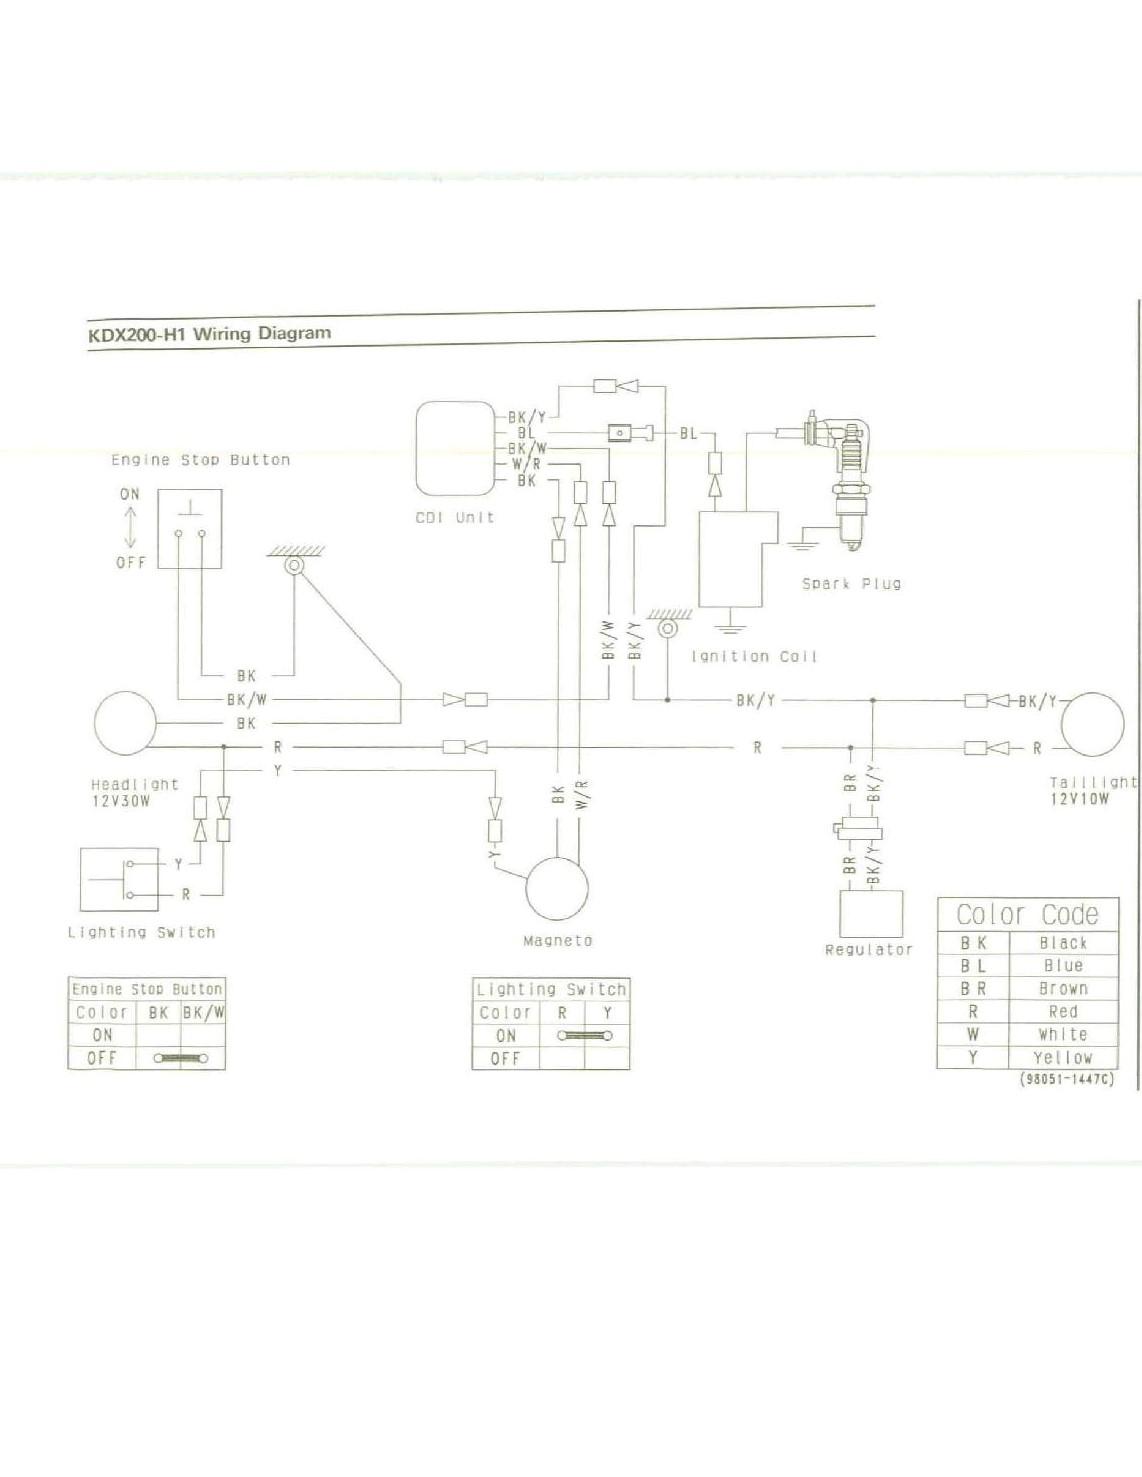 kdx 200 wiring diagram wiring diagram toolboxkdx 200 wiring diagram diagram data schema kawasaki kdx 200 [ 1142 x 1477 Pixel ]